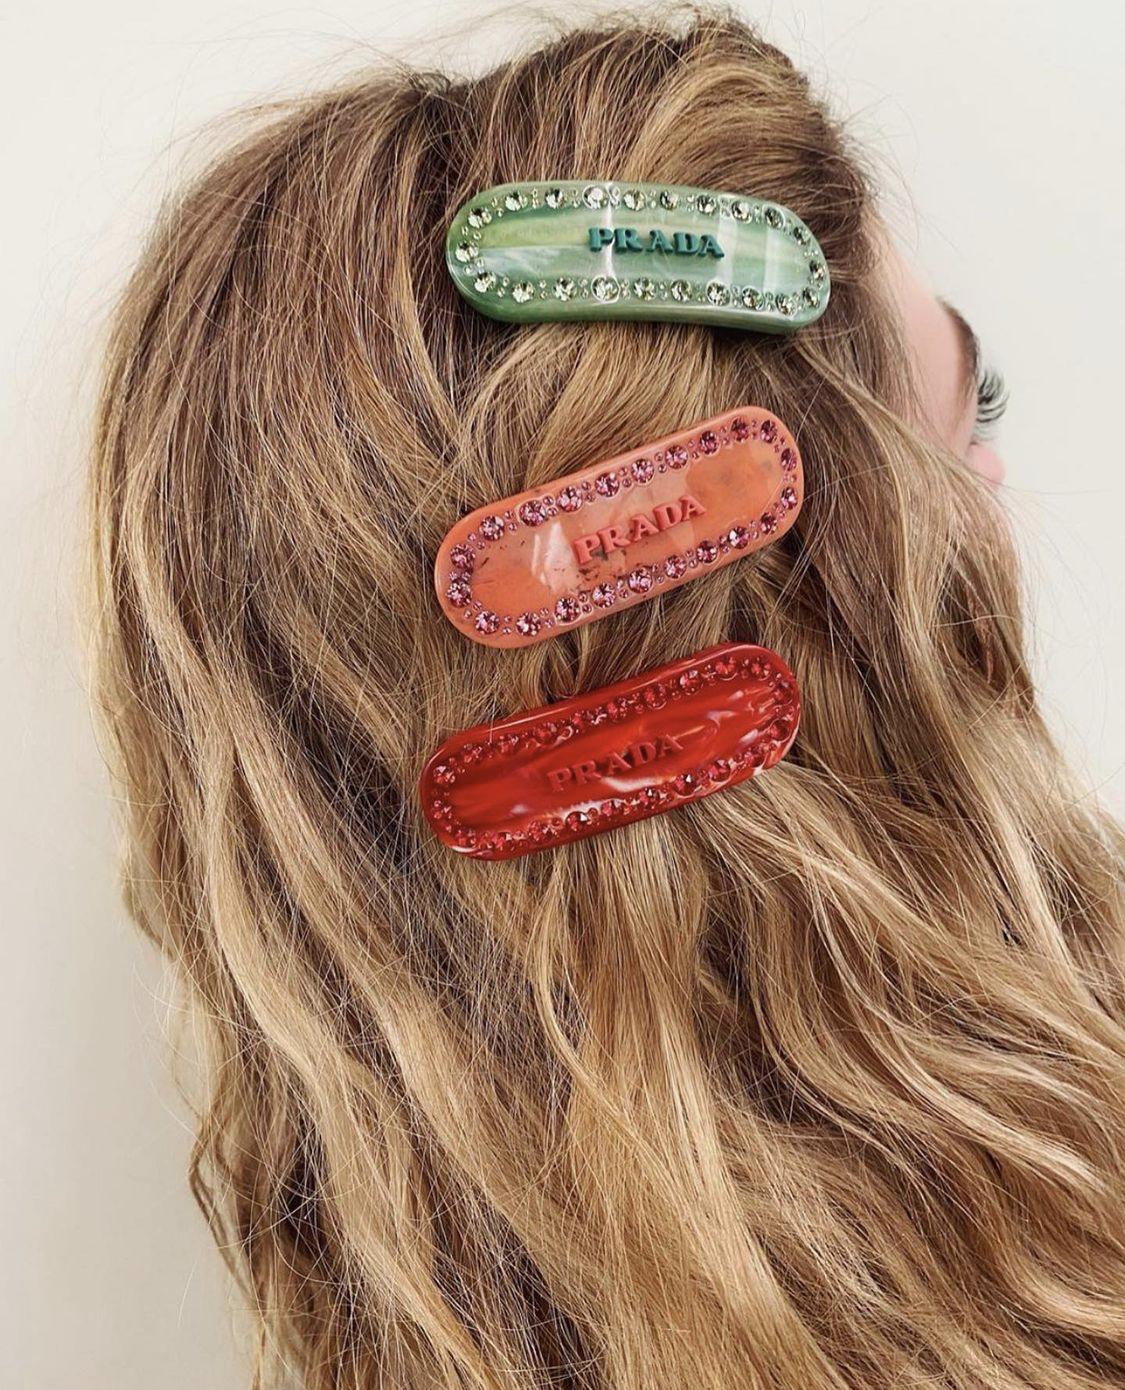 kẹp tóc prada